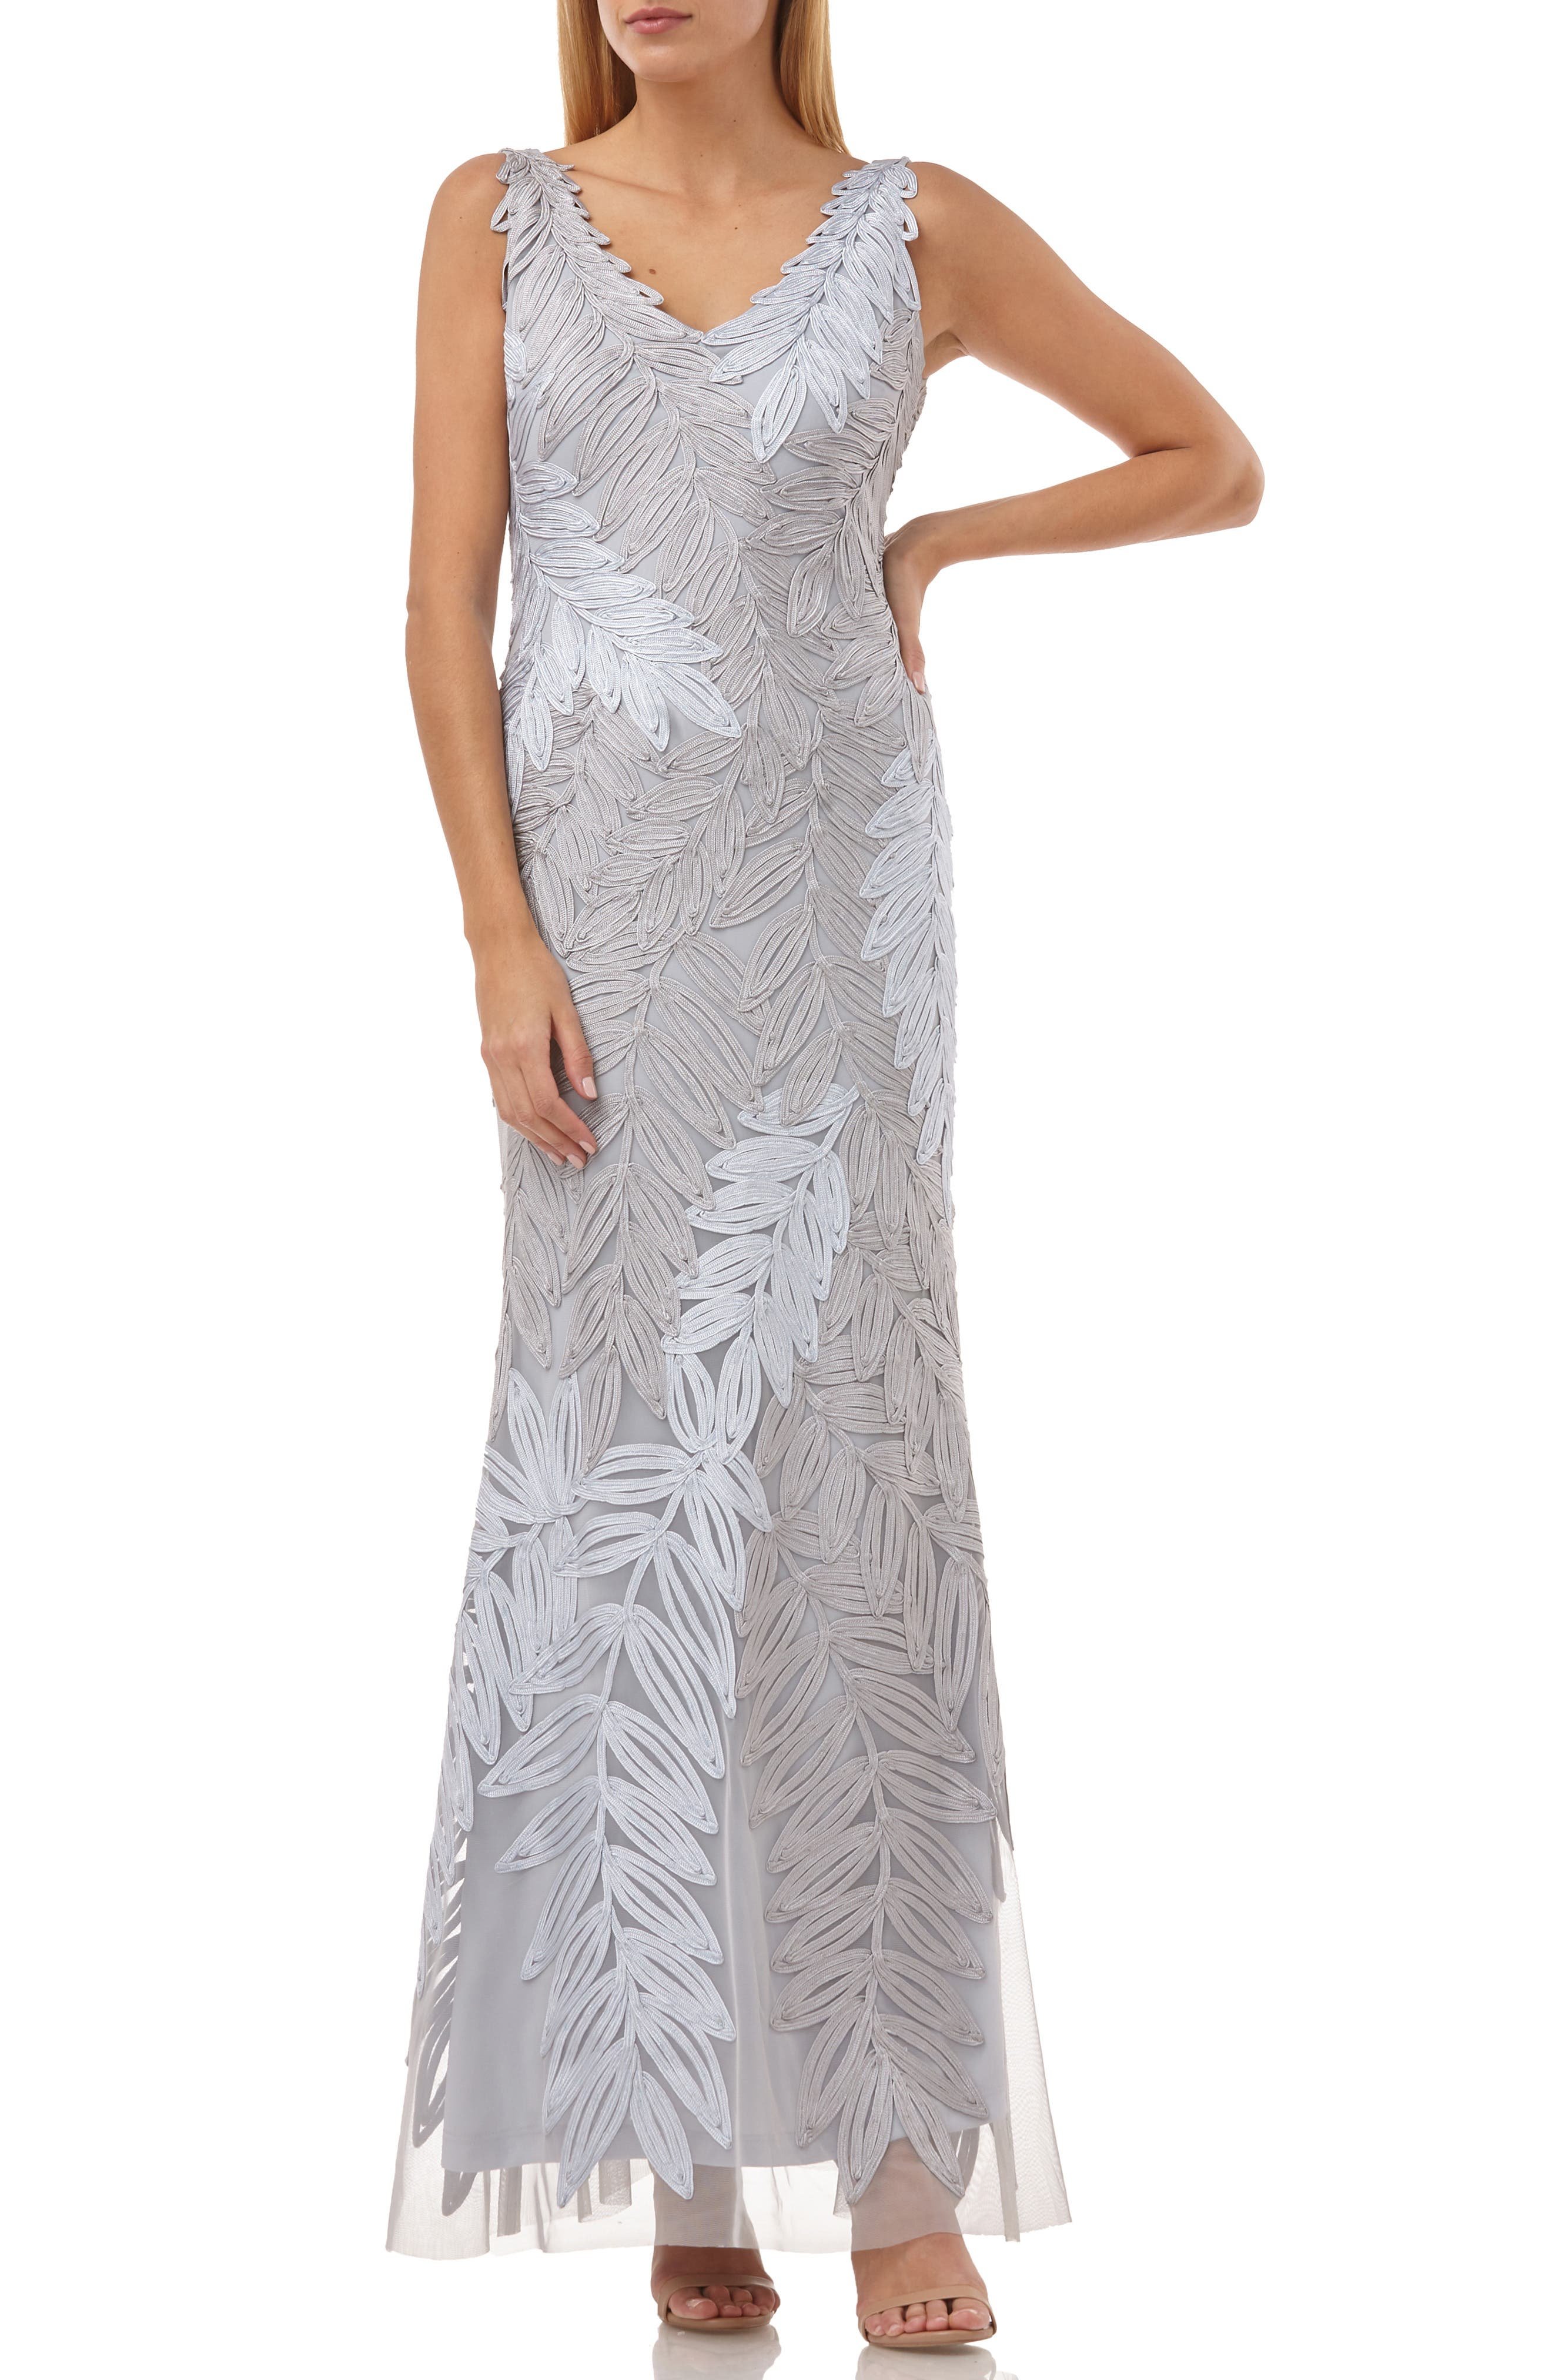 1960s – 70s Cocktail, Party, Prom, Evening Dresses Womens Js Collections Leaf Soutache Trumpet Gown Size 16 - Grey $214.80 AT vintagedancer.com